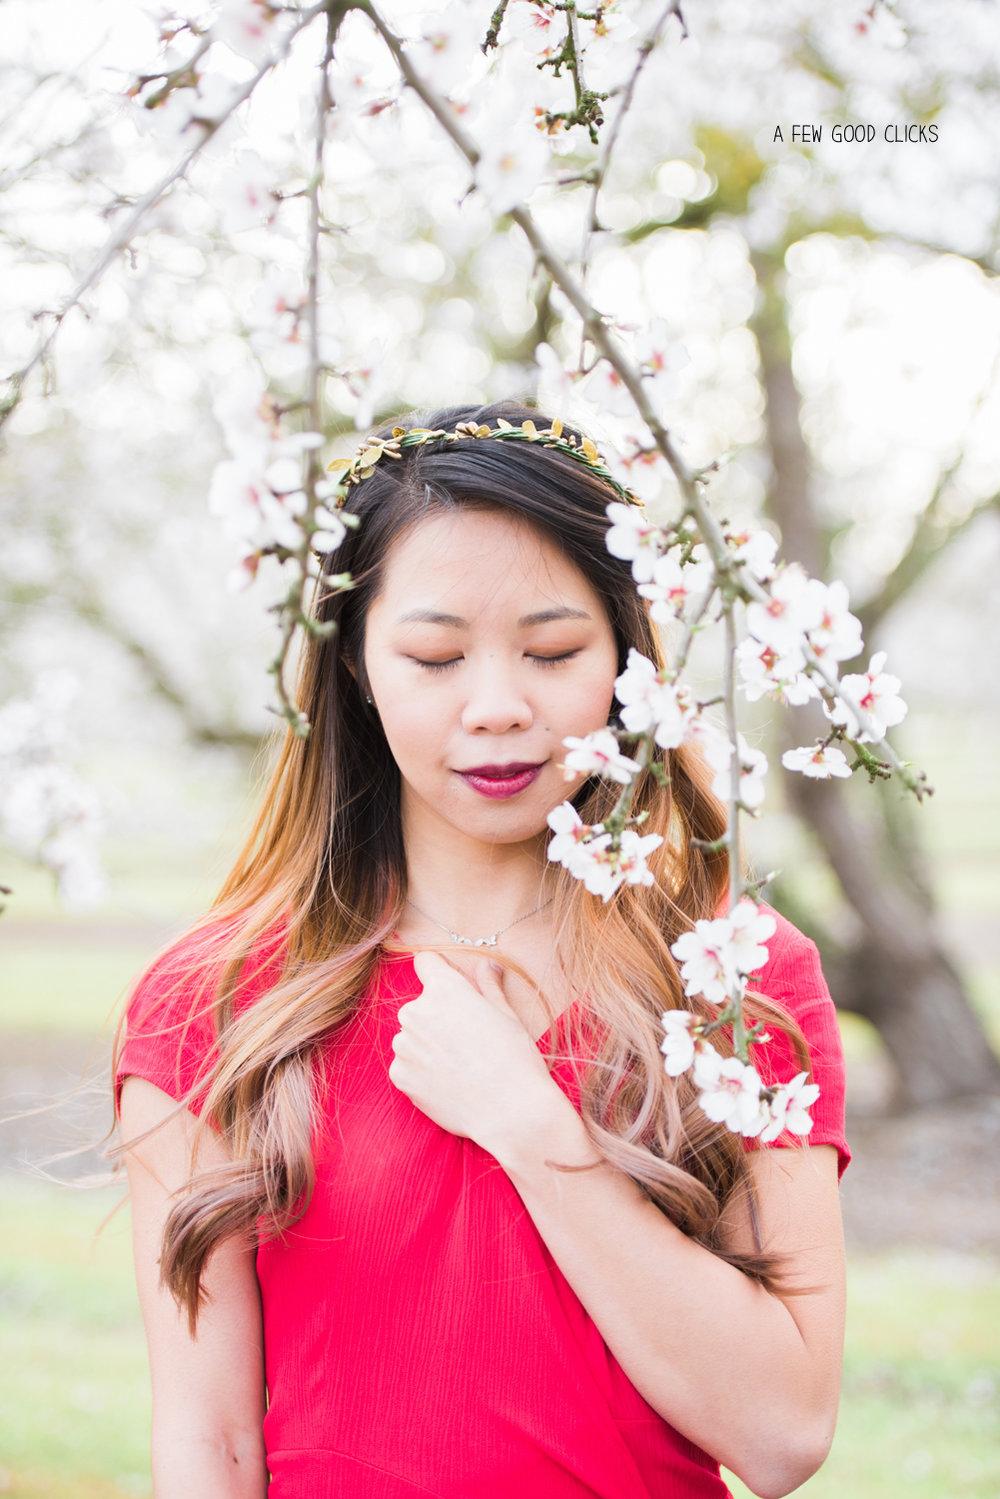 almond-blossom-lifestyle-portrait-photography-by-afewgoodclicks-net-122.jpg